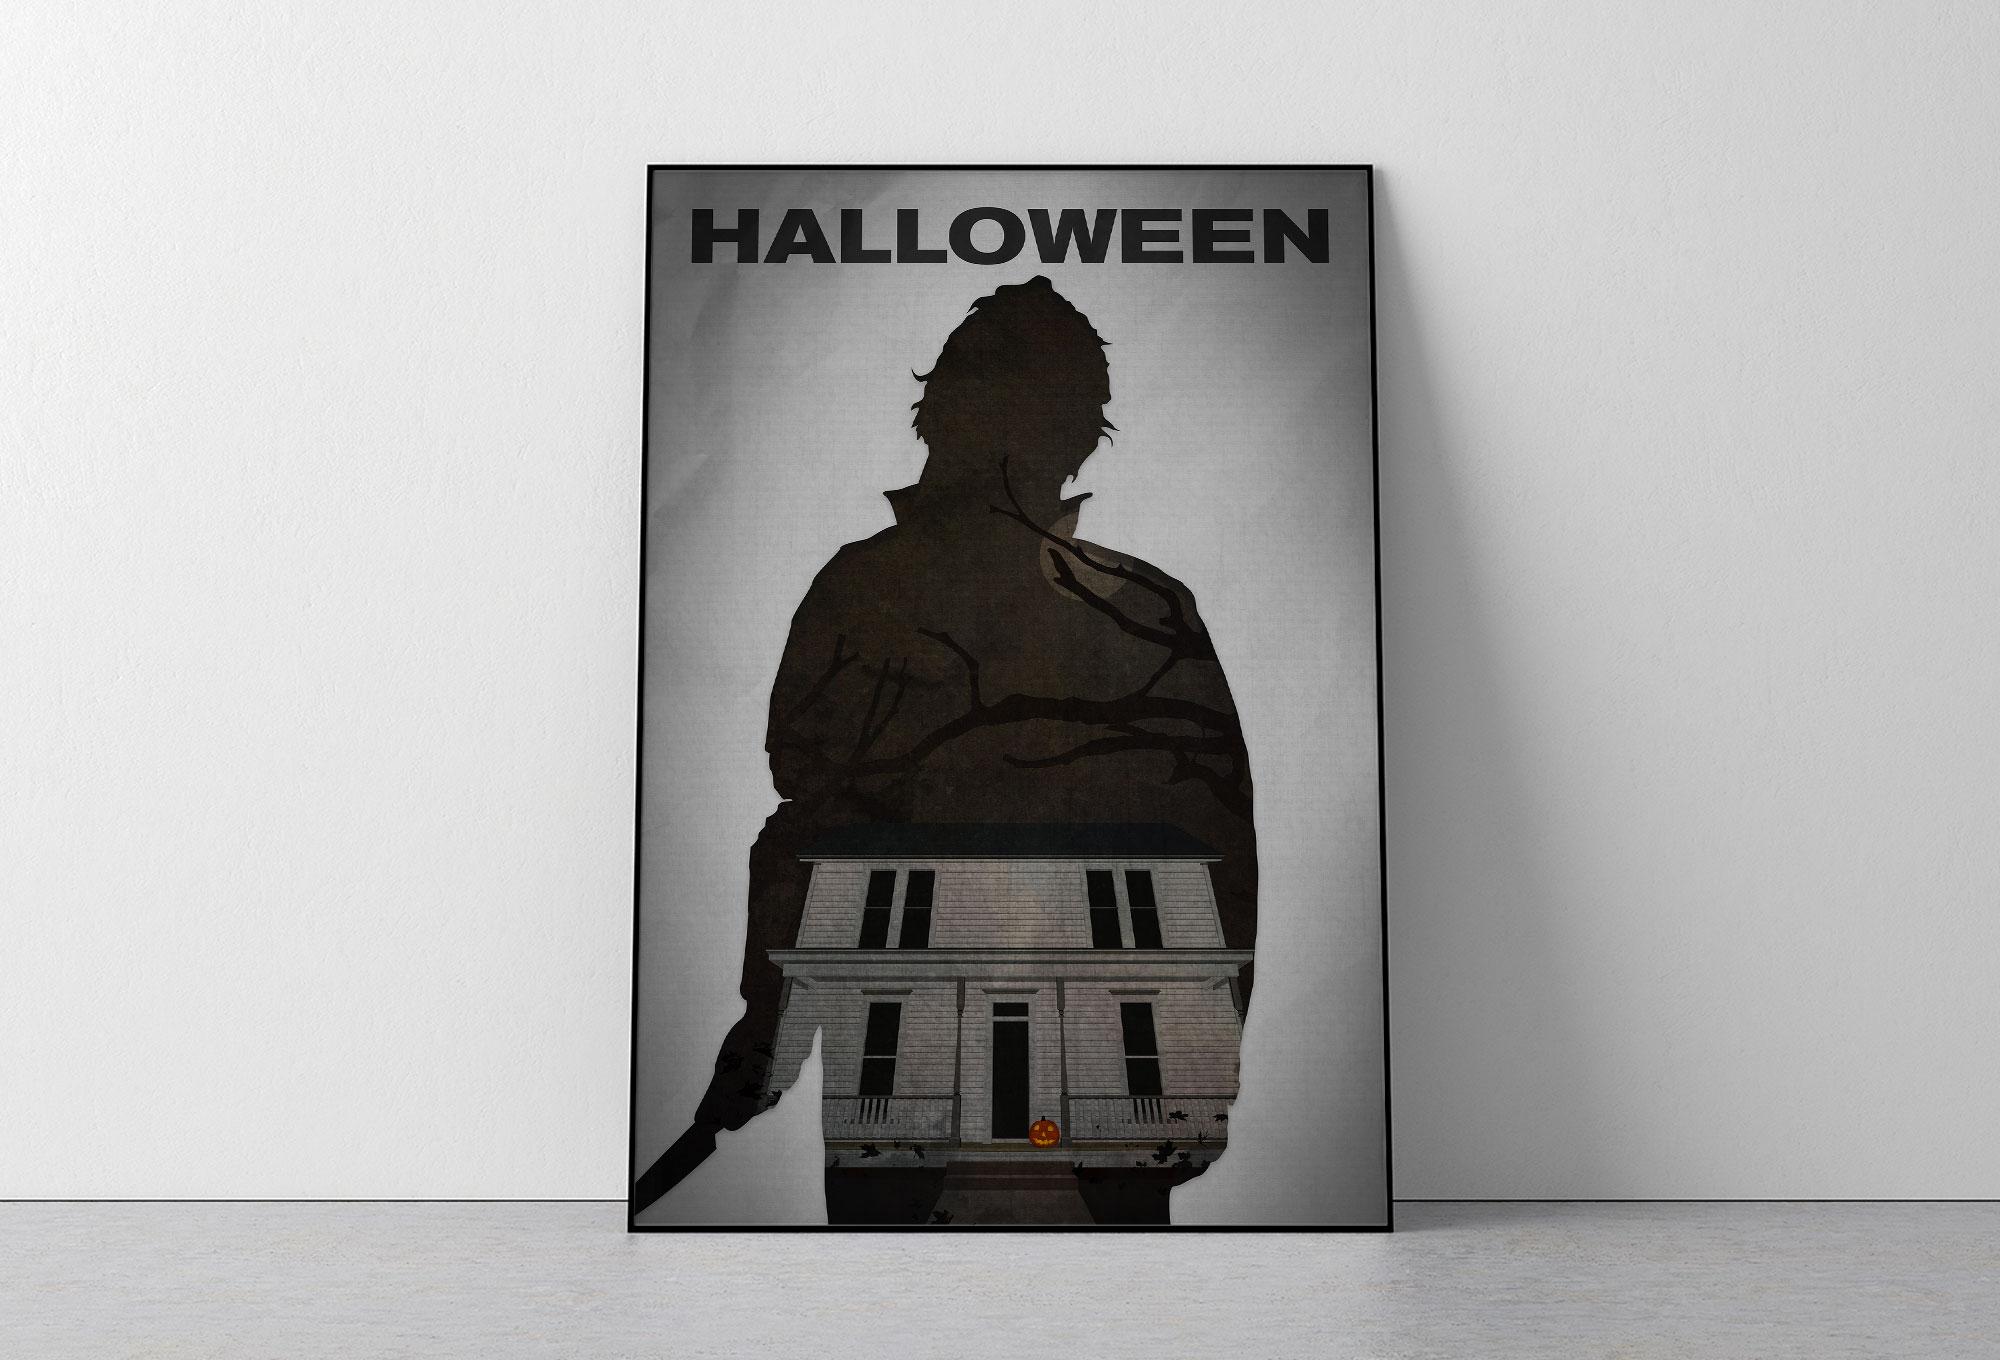 Halloween-Poster-Mockup.jpg